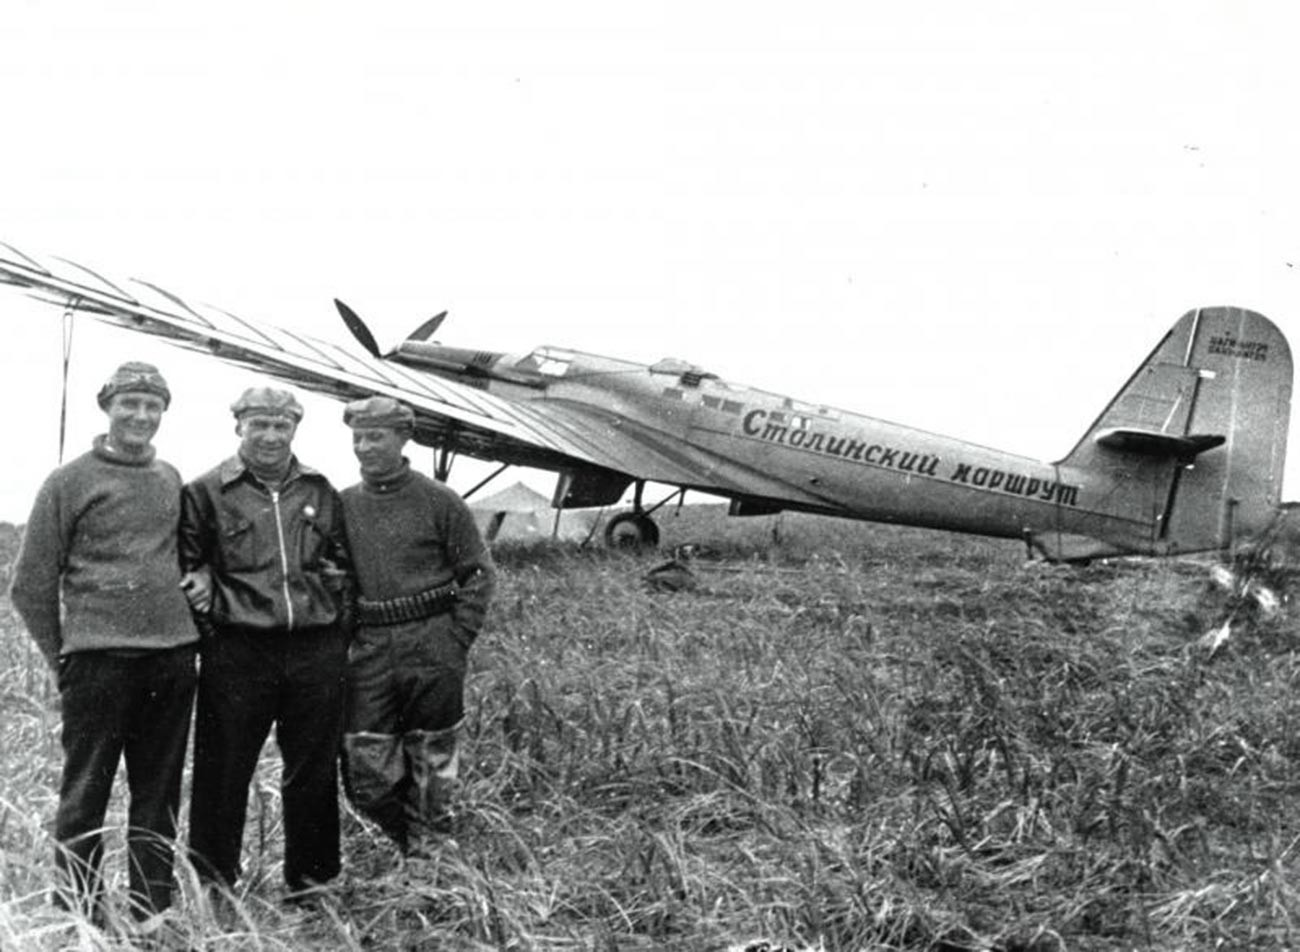 Alexander Balyakov (L), Valery Chkalov and Georgy Baydukov.